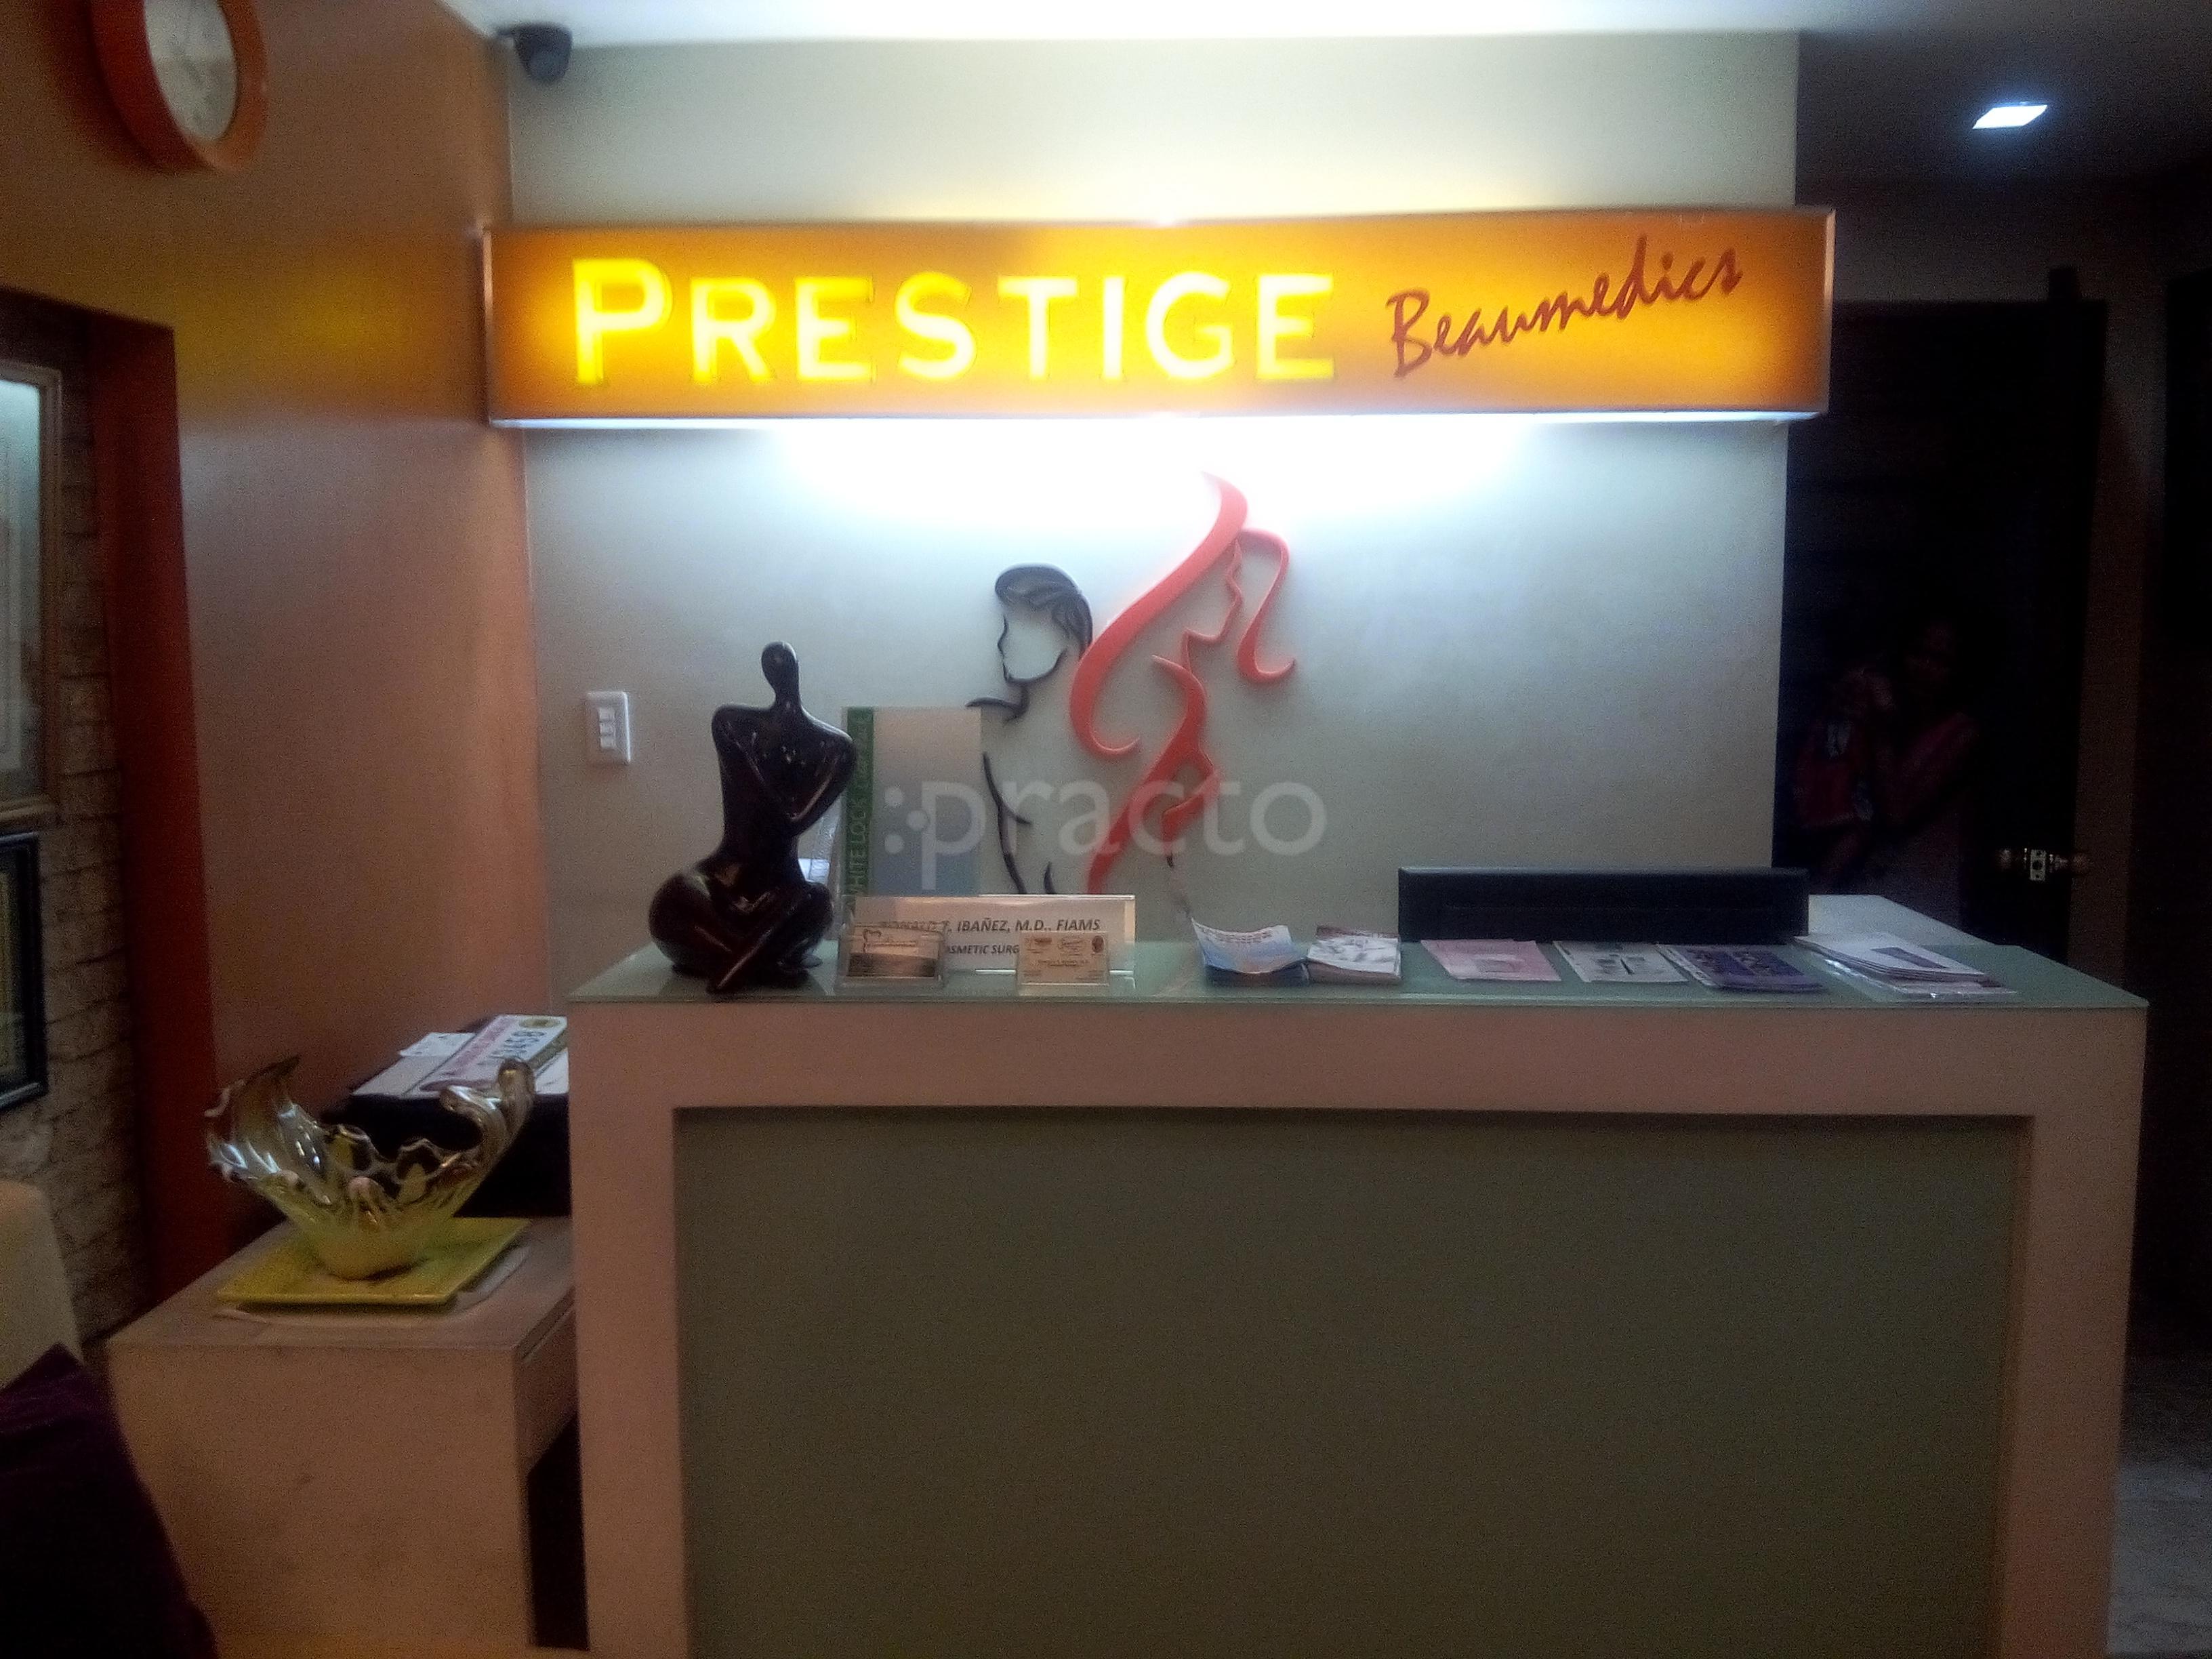 Prestige Beaumedic Aesthetic Medical